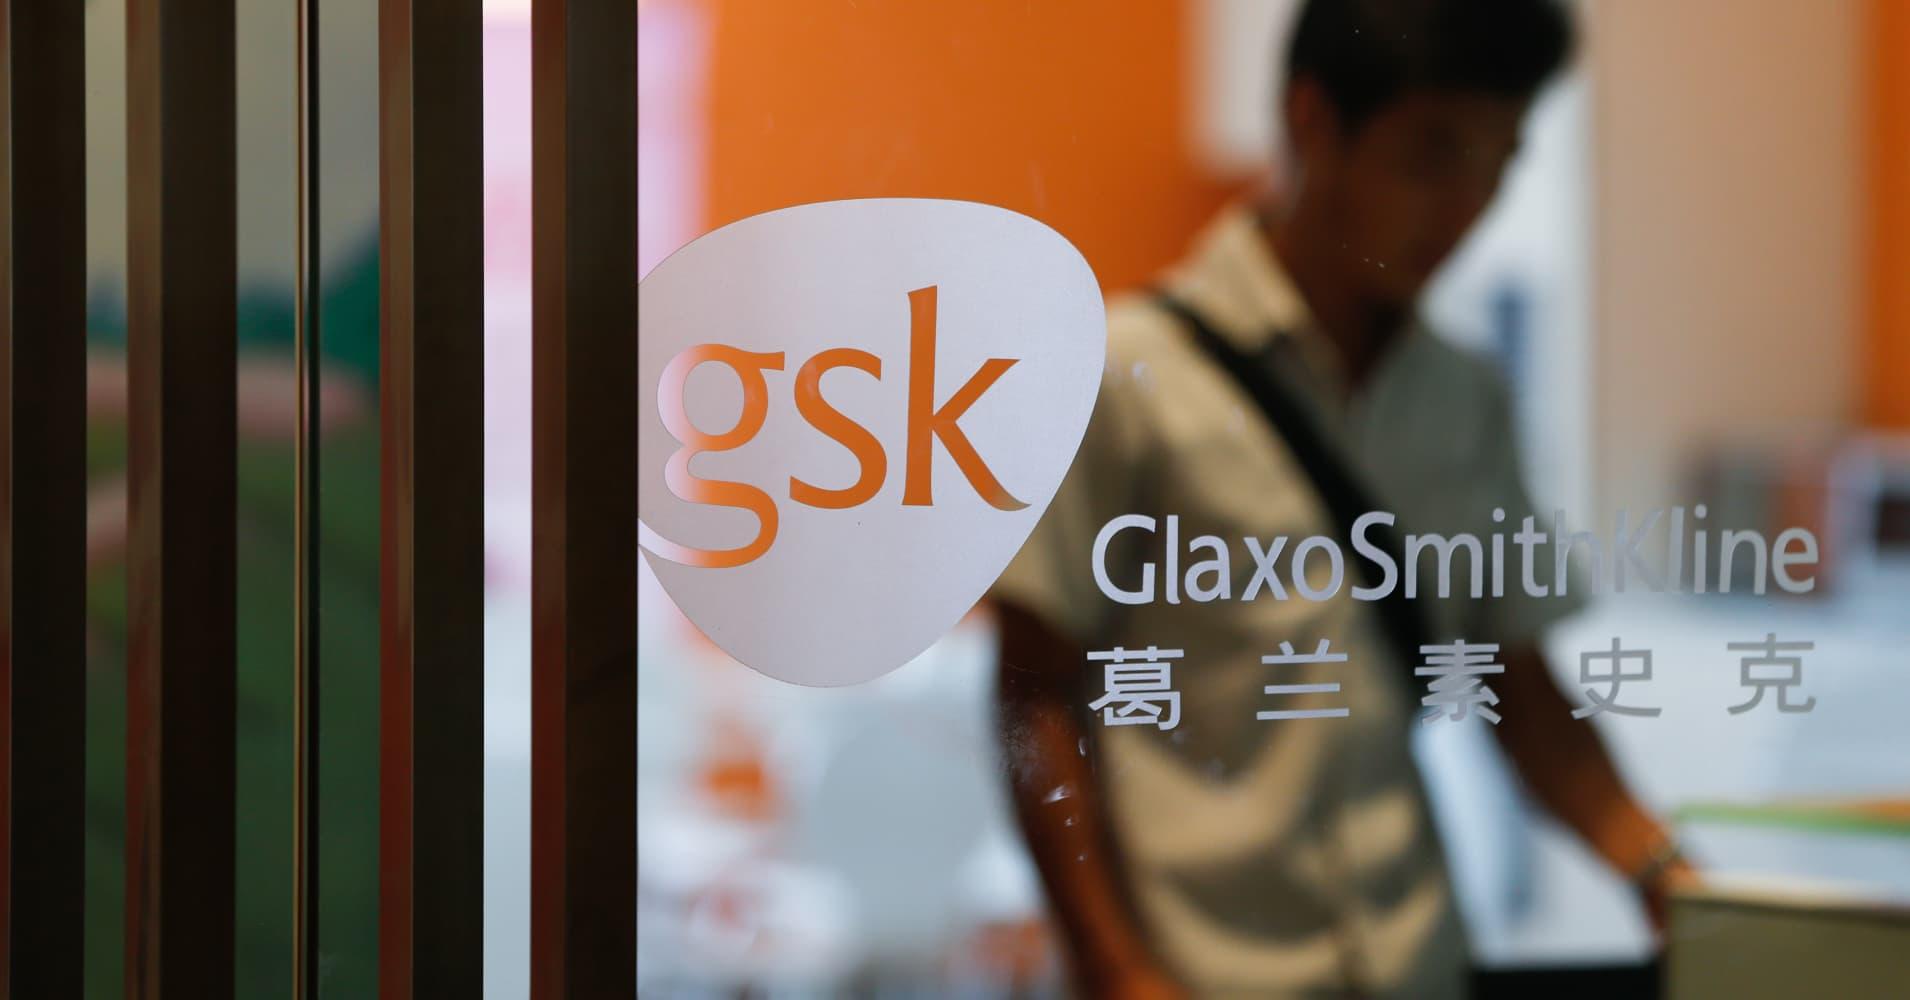 Gsk buys novartis stake in consumer health care venture for 13 gsk buys novartis stake in consumer health care venture for 13 billion biocorpaavc Gallery